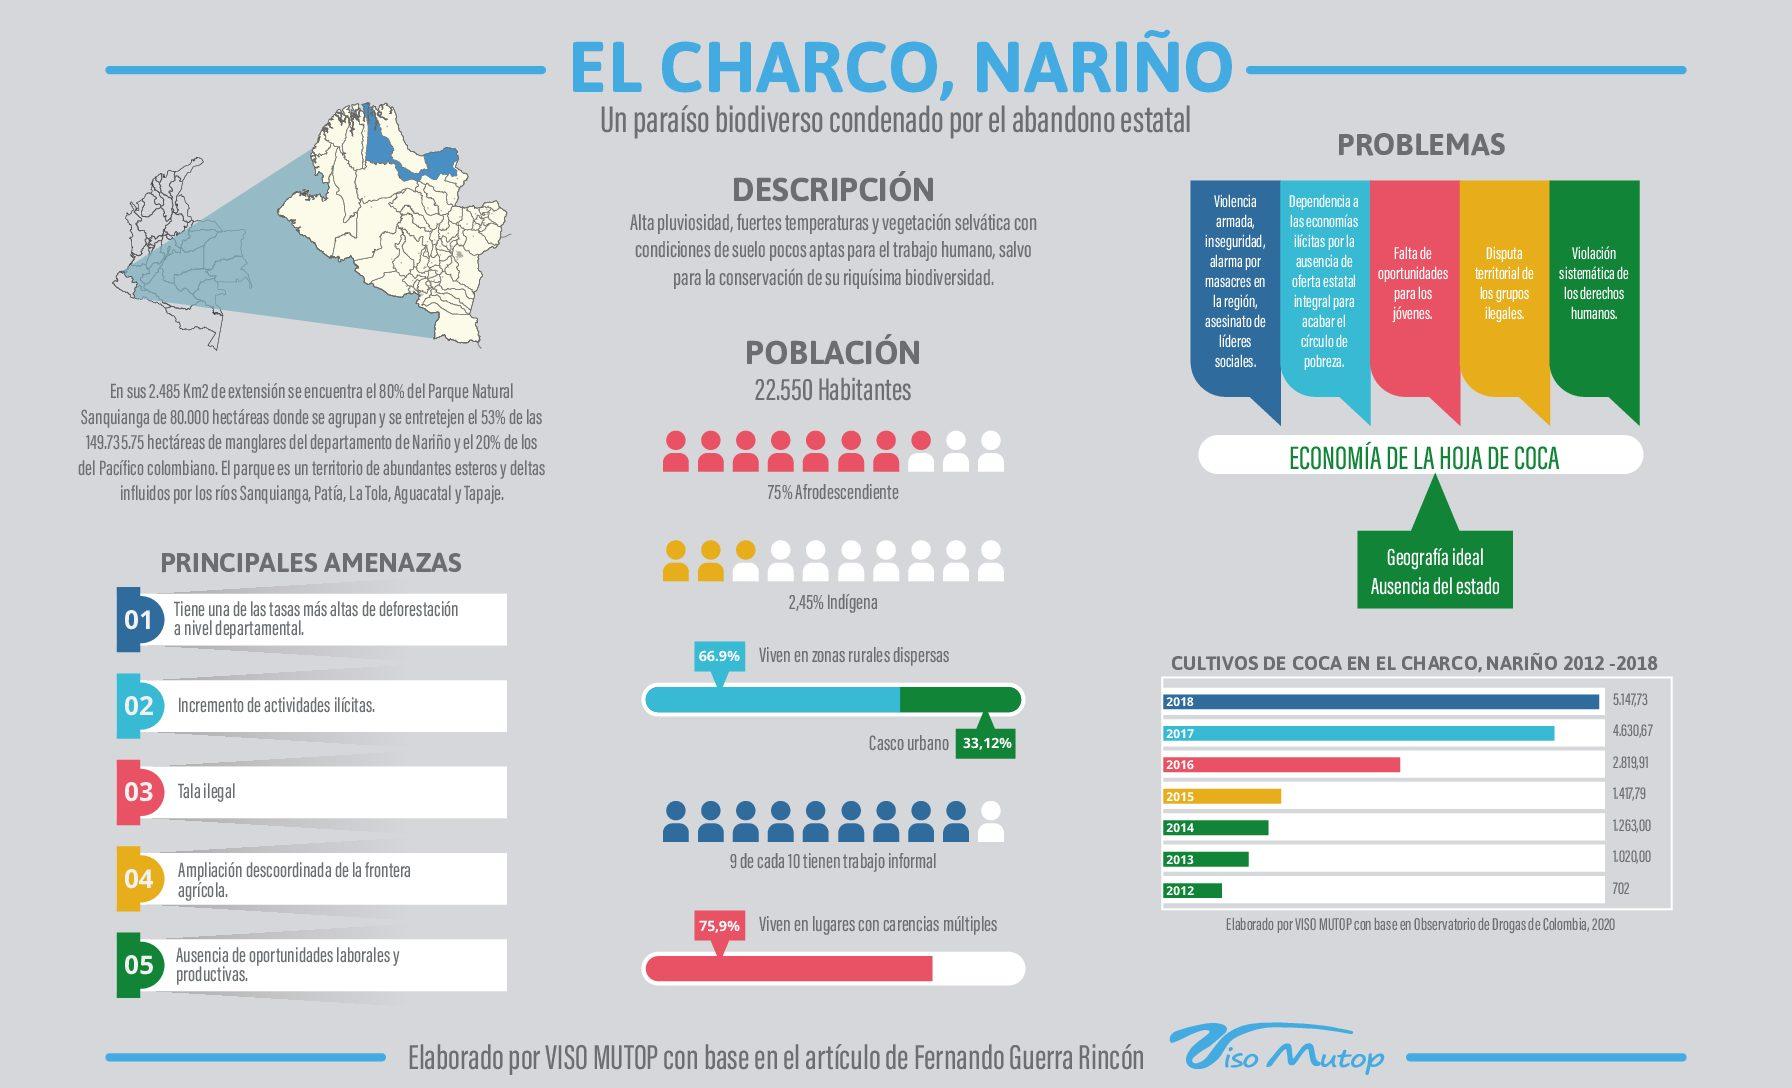 El Charco, Nariño.